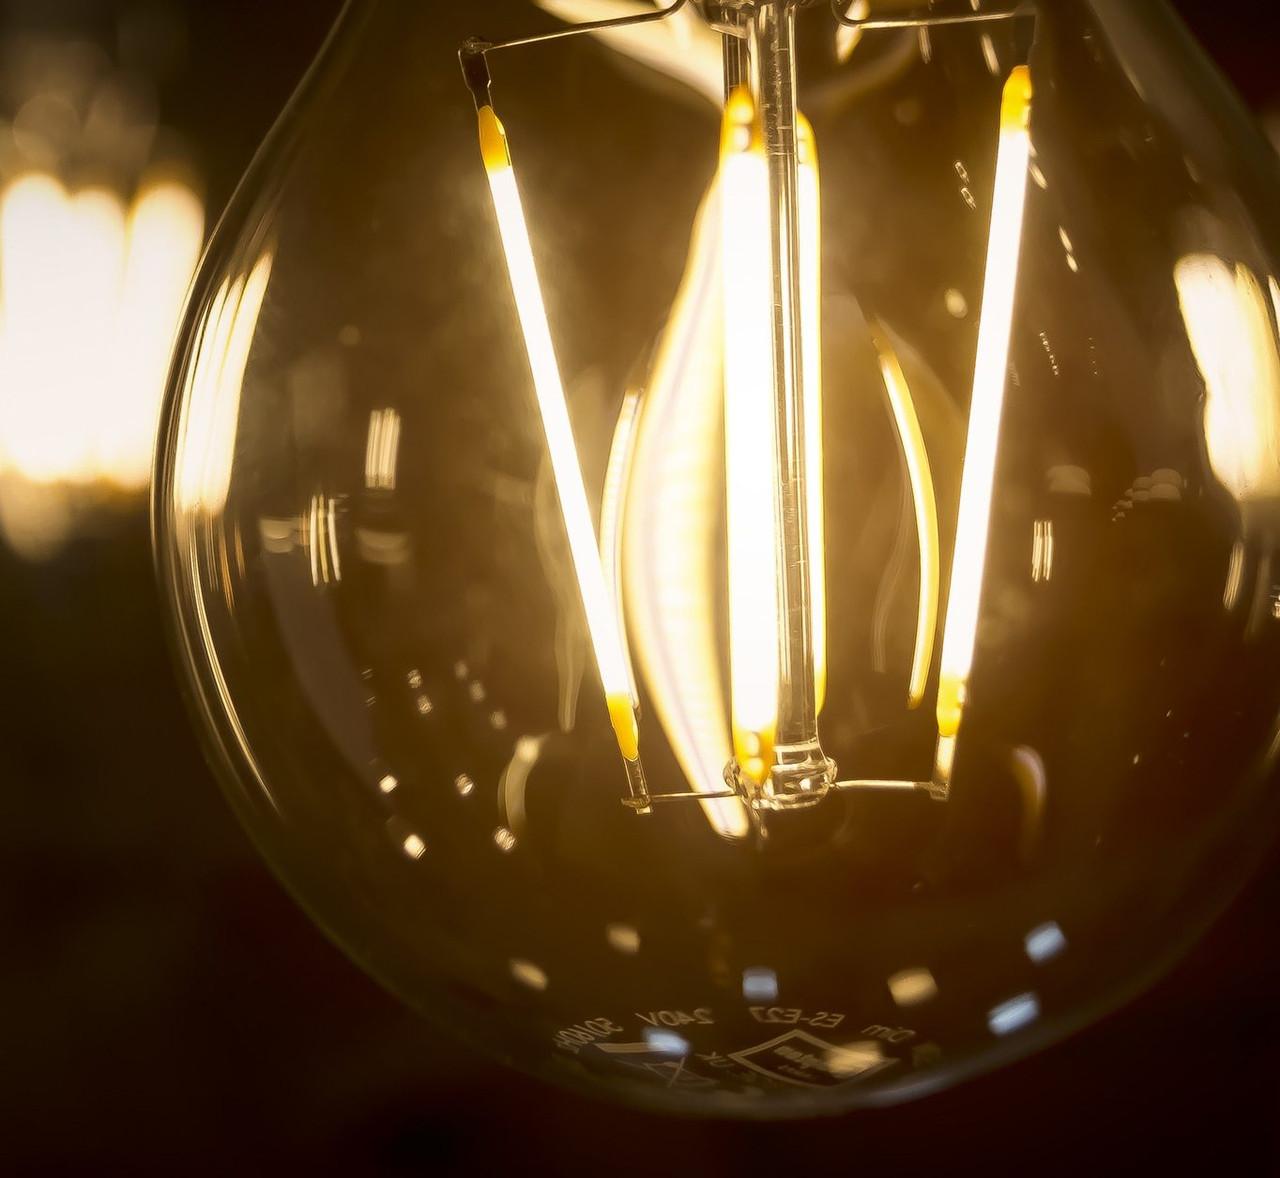 LED GLS 2700K and 4000K Light Bulbs